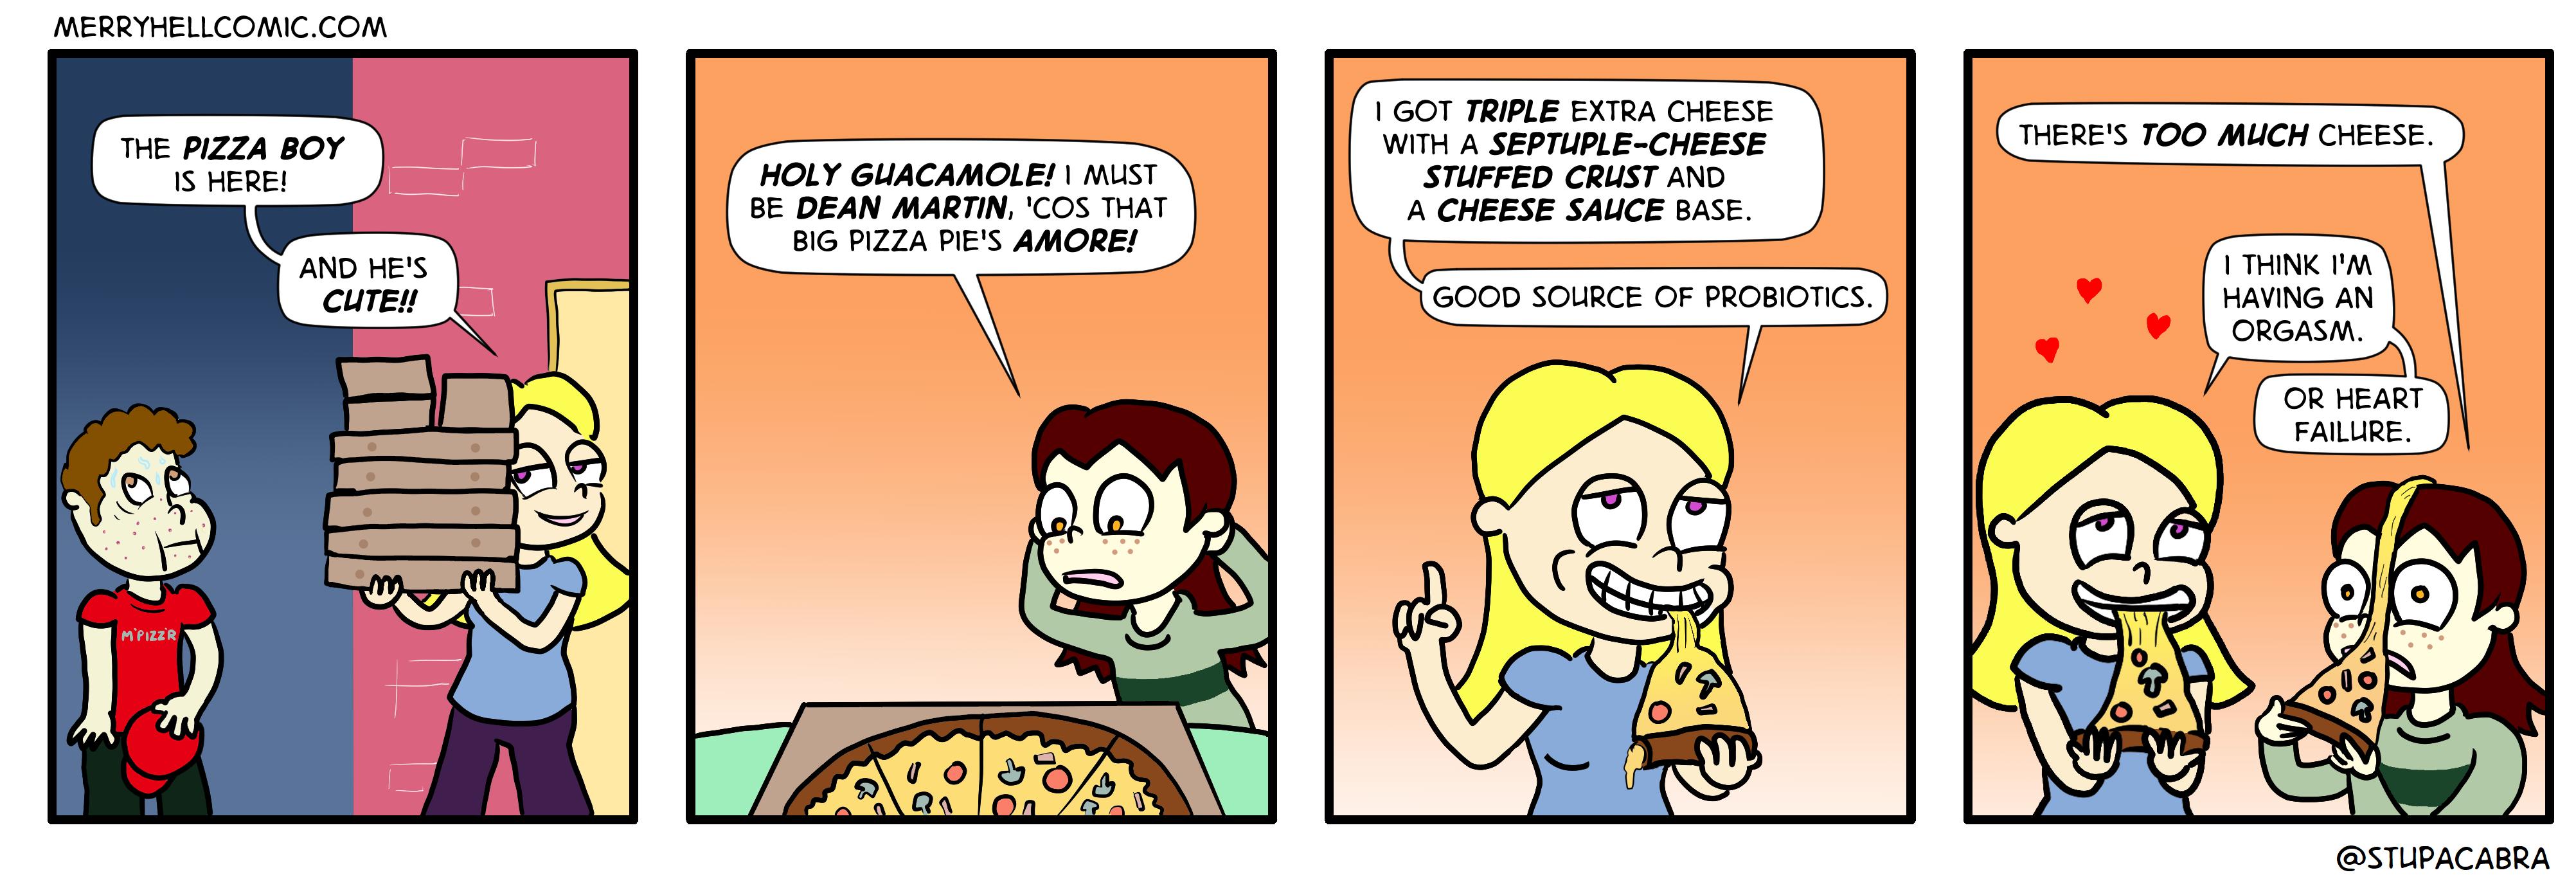 364. Cheese